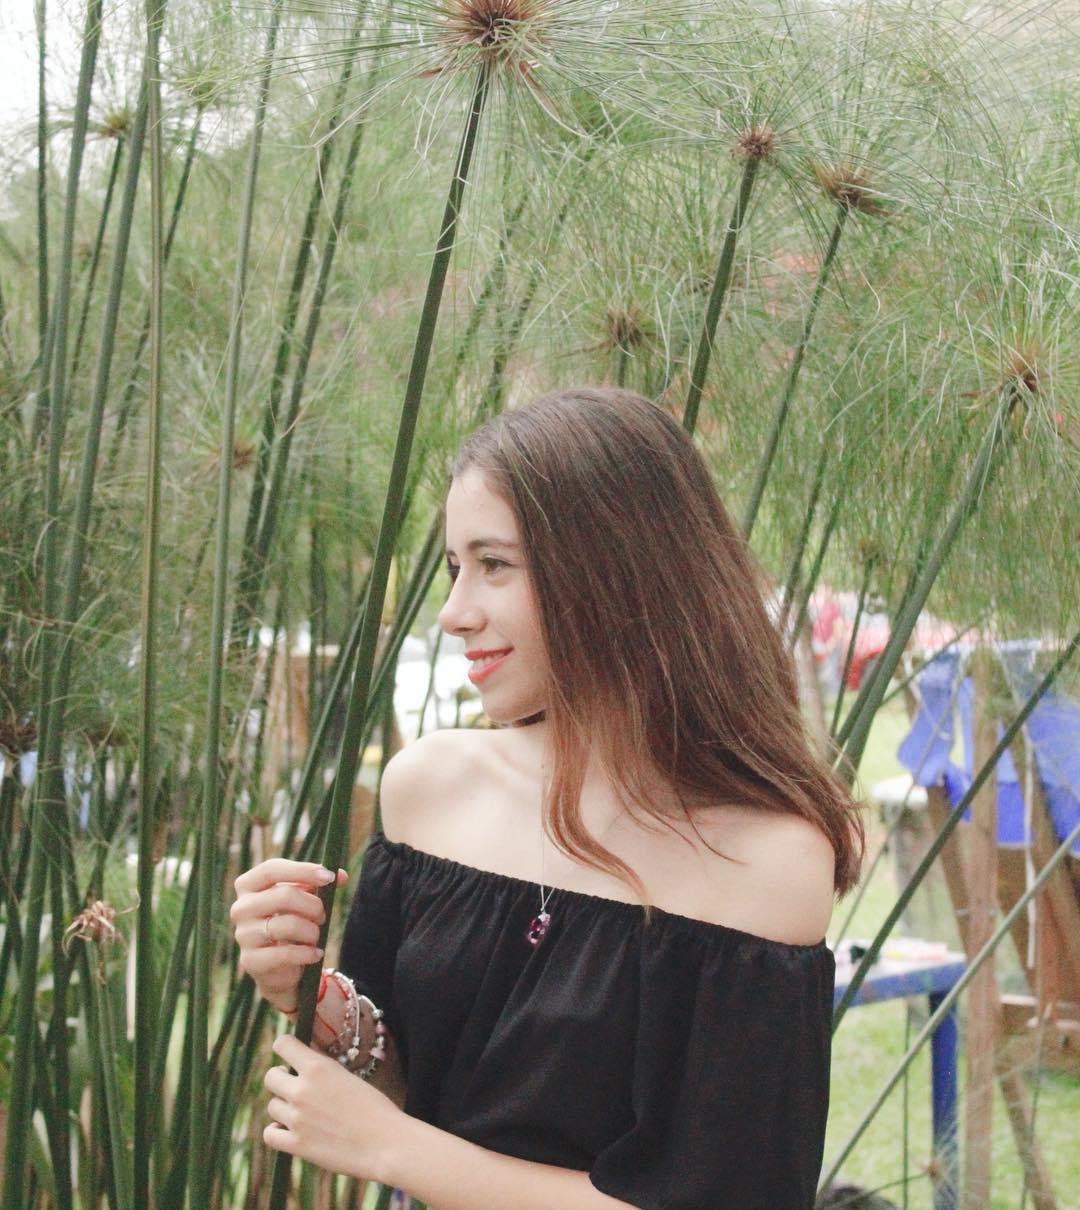 maya mejia ospina, miss teen mundial colombia 2019. 56189711